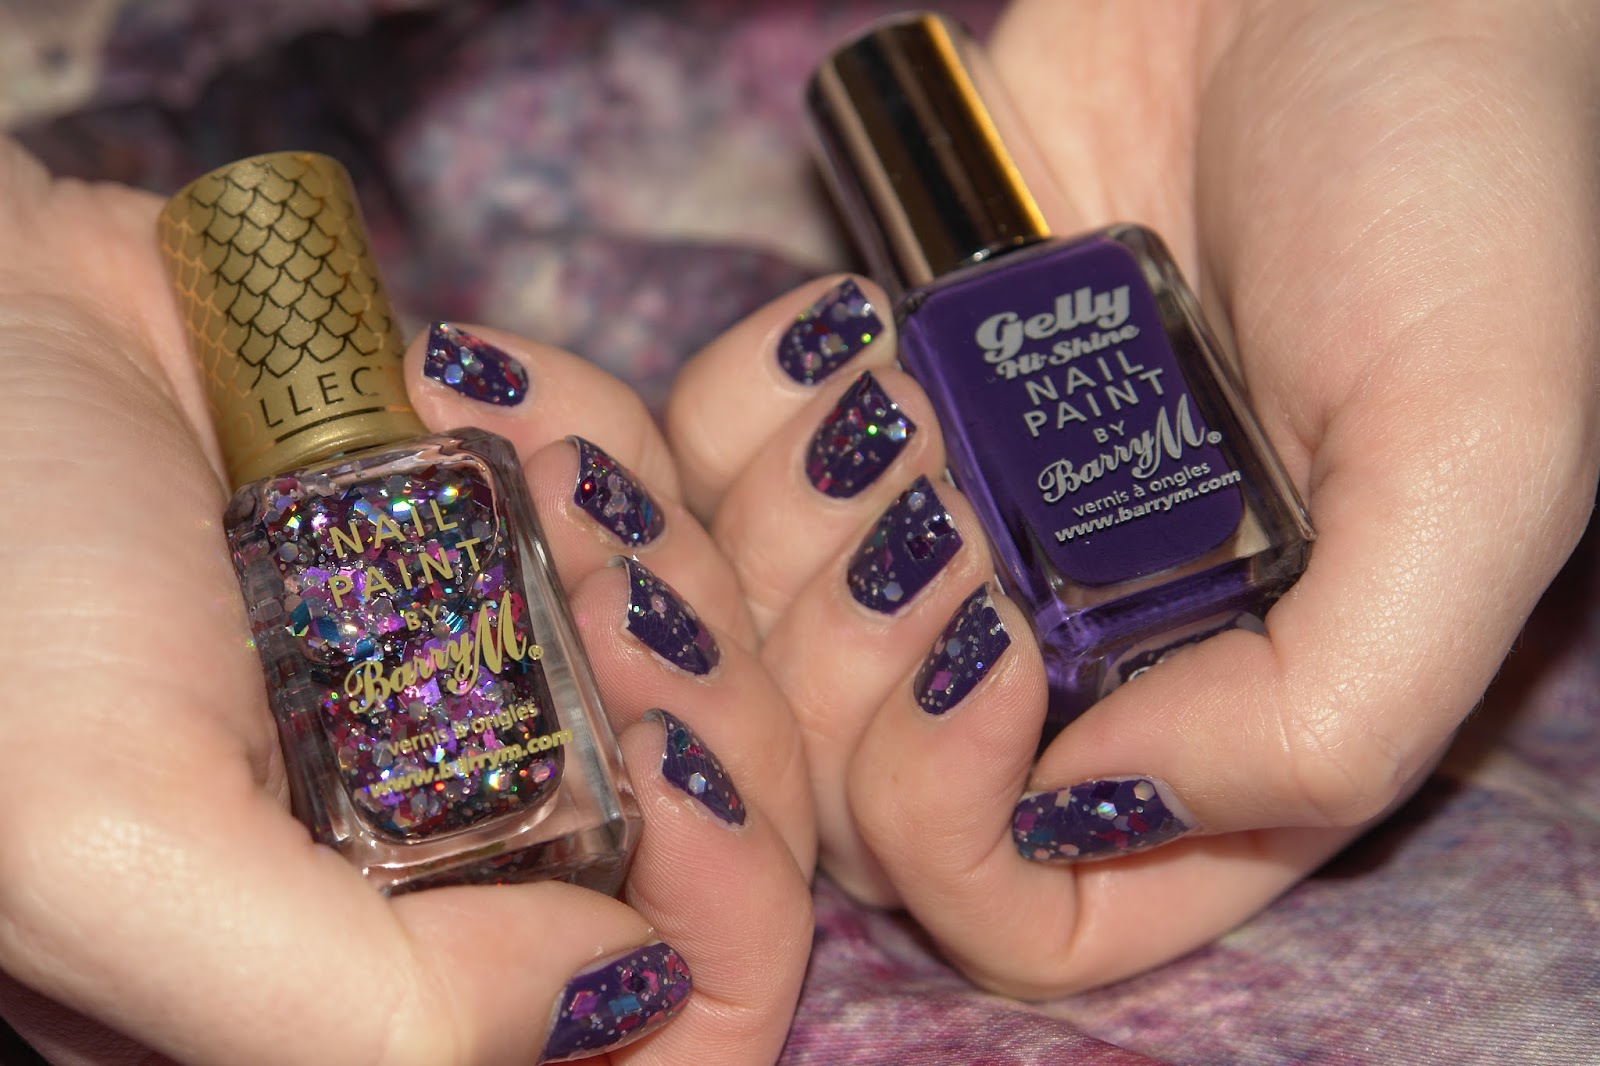 NAILS: atlantis and purple, nail polish, nails, NOTD, Barry M, glitter, purple, Gelly Hi-Shine range, Plum, beauty blog, UK blog, blogger, swatches, Aquarium Collection, Atlantis, Atlantis nail polish